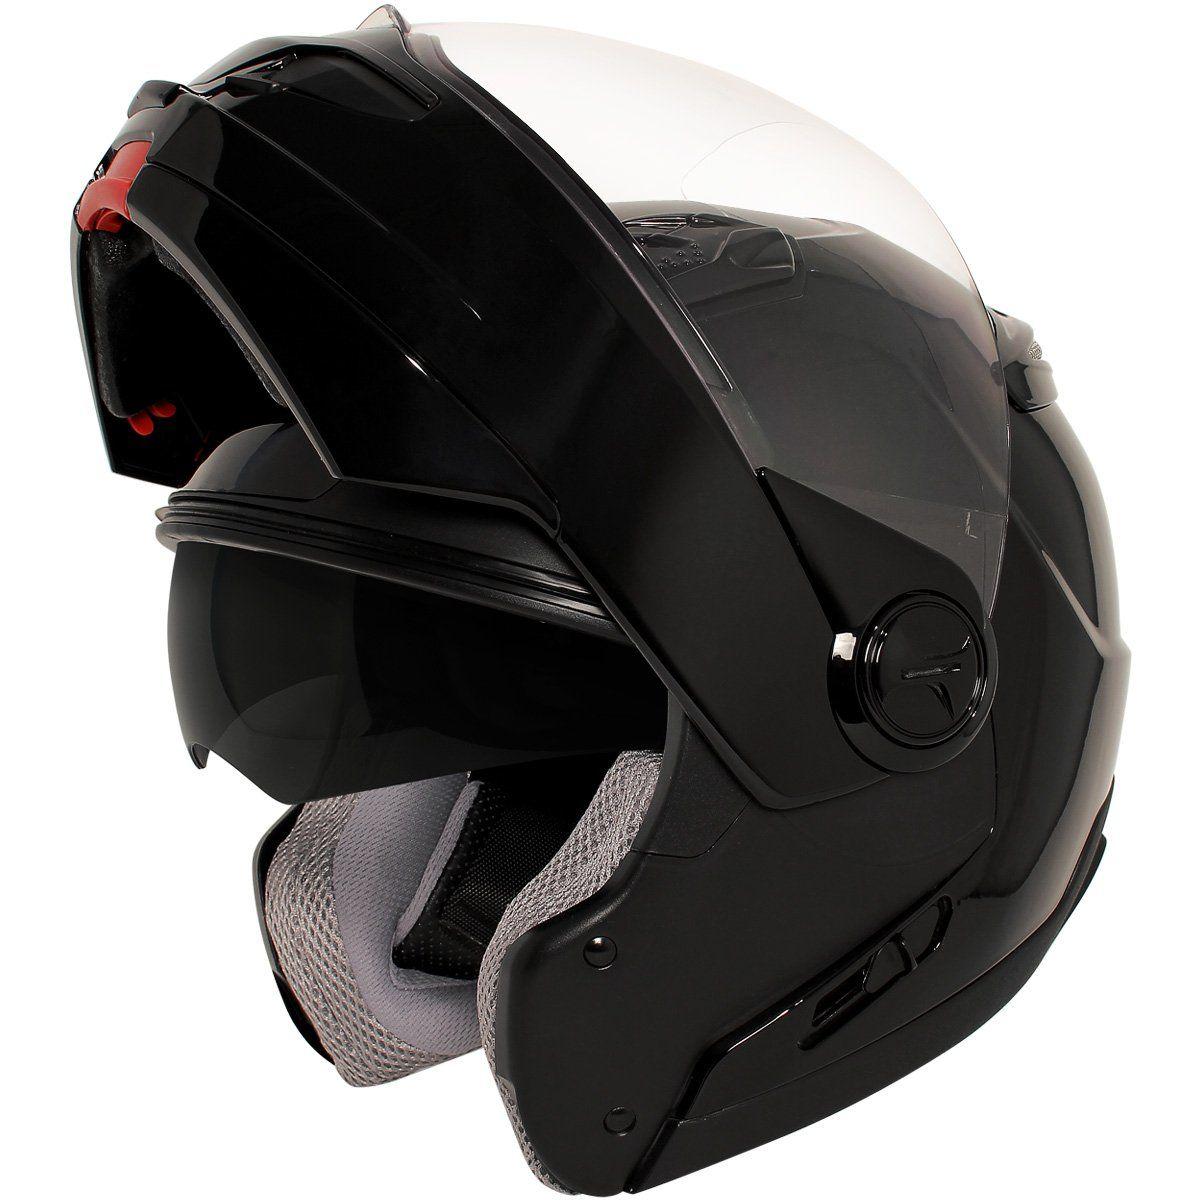 Hawk st transition in glossy black modular helmet with hawk